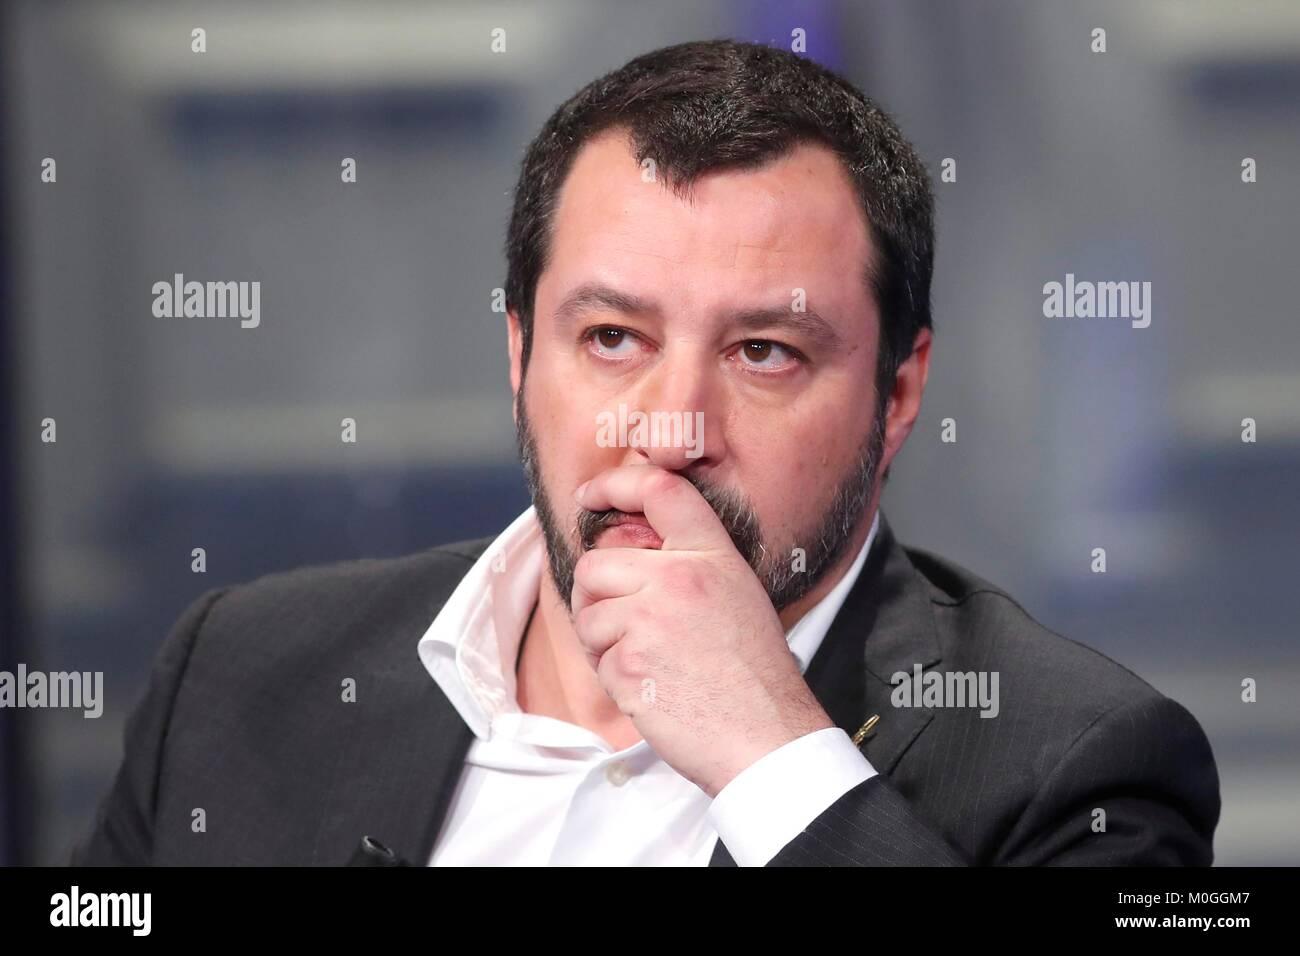 Italy, Rome, 19 January, 2018 : The leader of  Movement Lega Nord, Matteo Salvini at the talk show 'Porta a - Stock Image